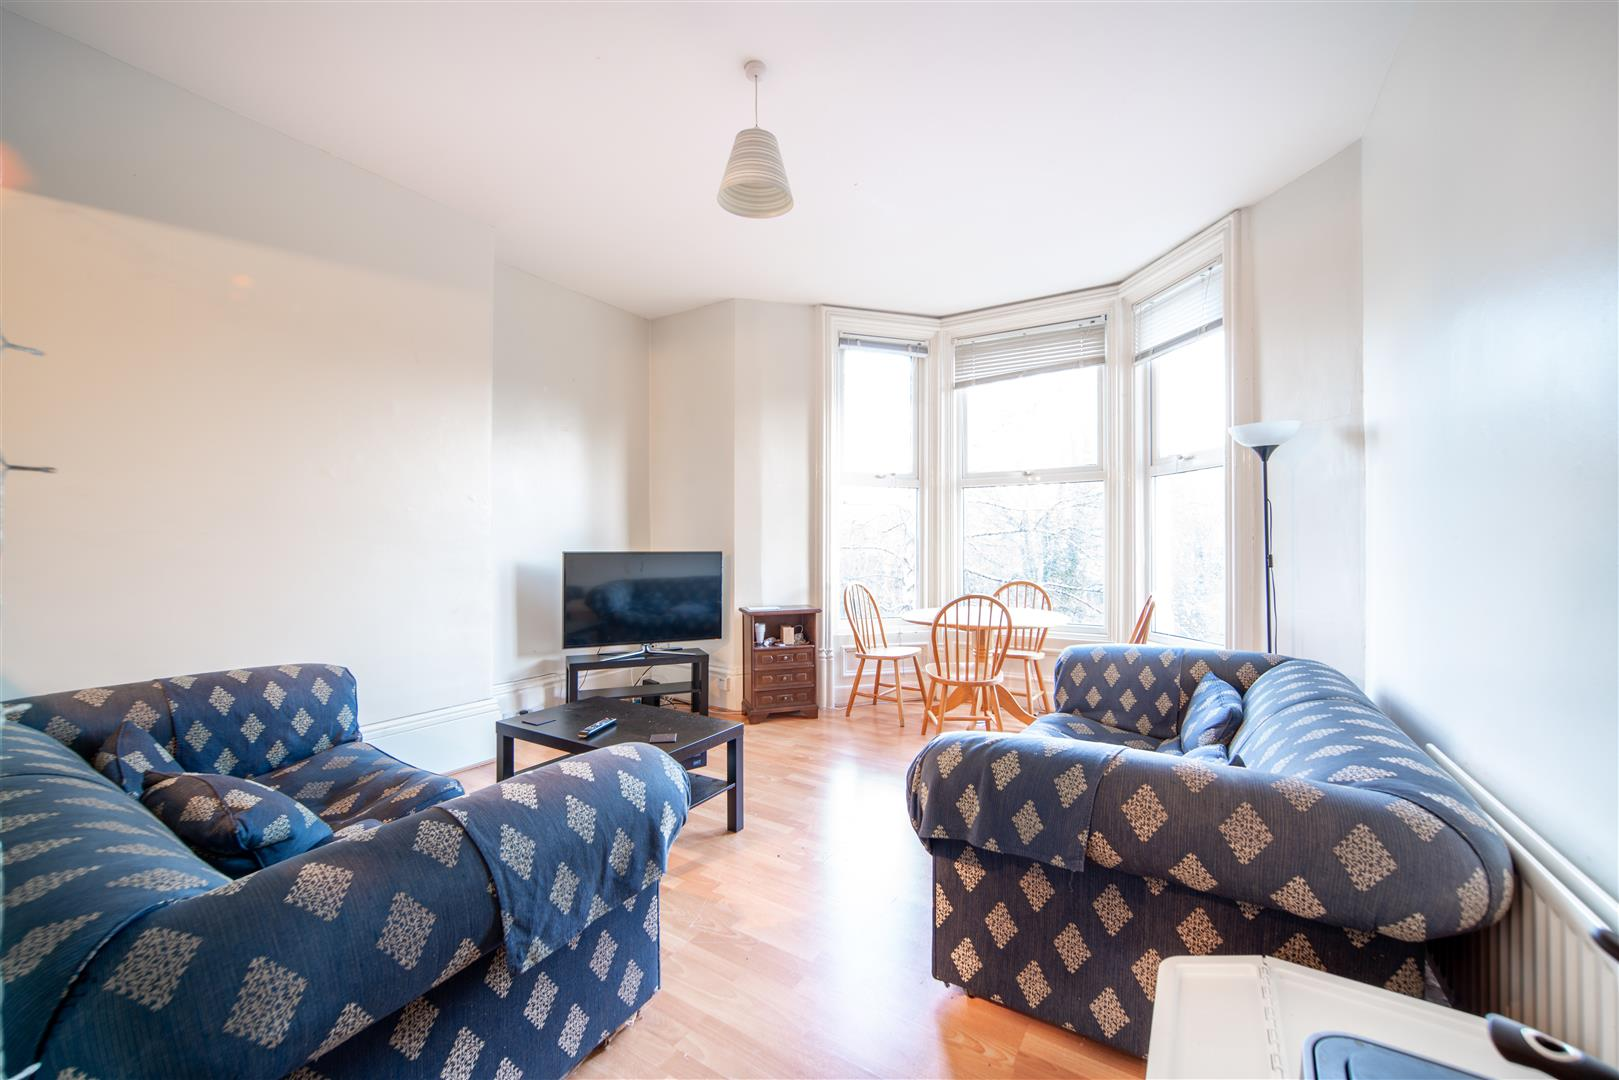 4 bed flat to rent in Newcastle Upon Tyne, NE2 4RL, NE2